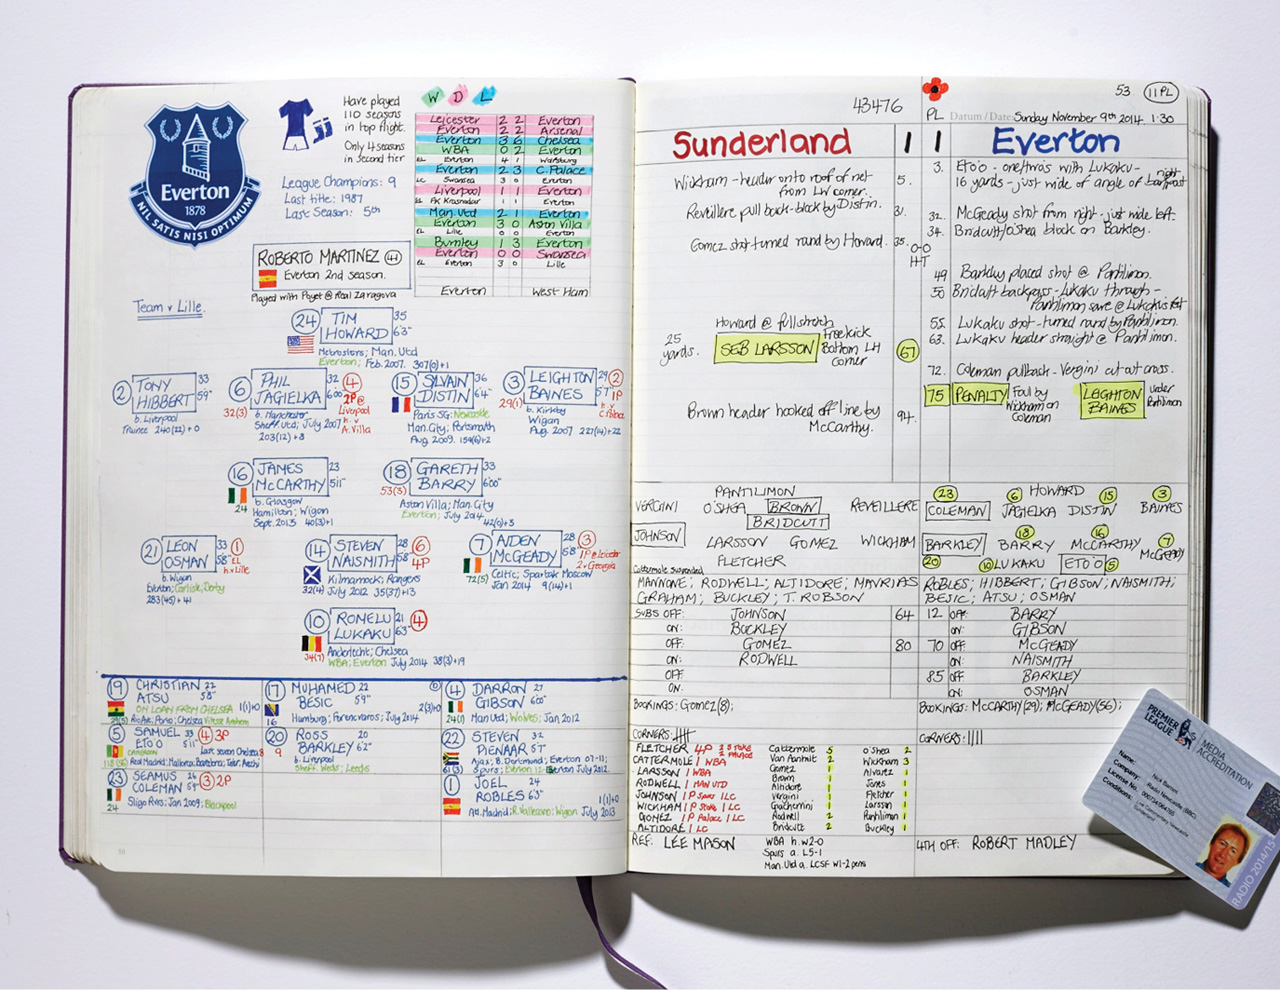 3046336-slide-s-6-peek-inside-the-gorgeous-notebooks-cheatsheetwebnick6.jpg